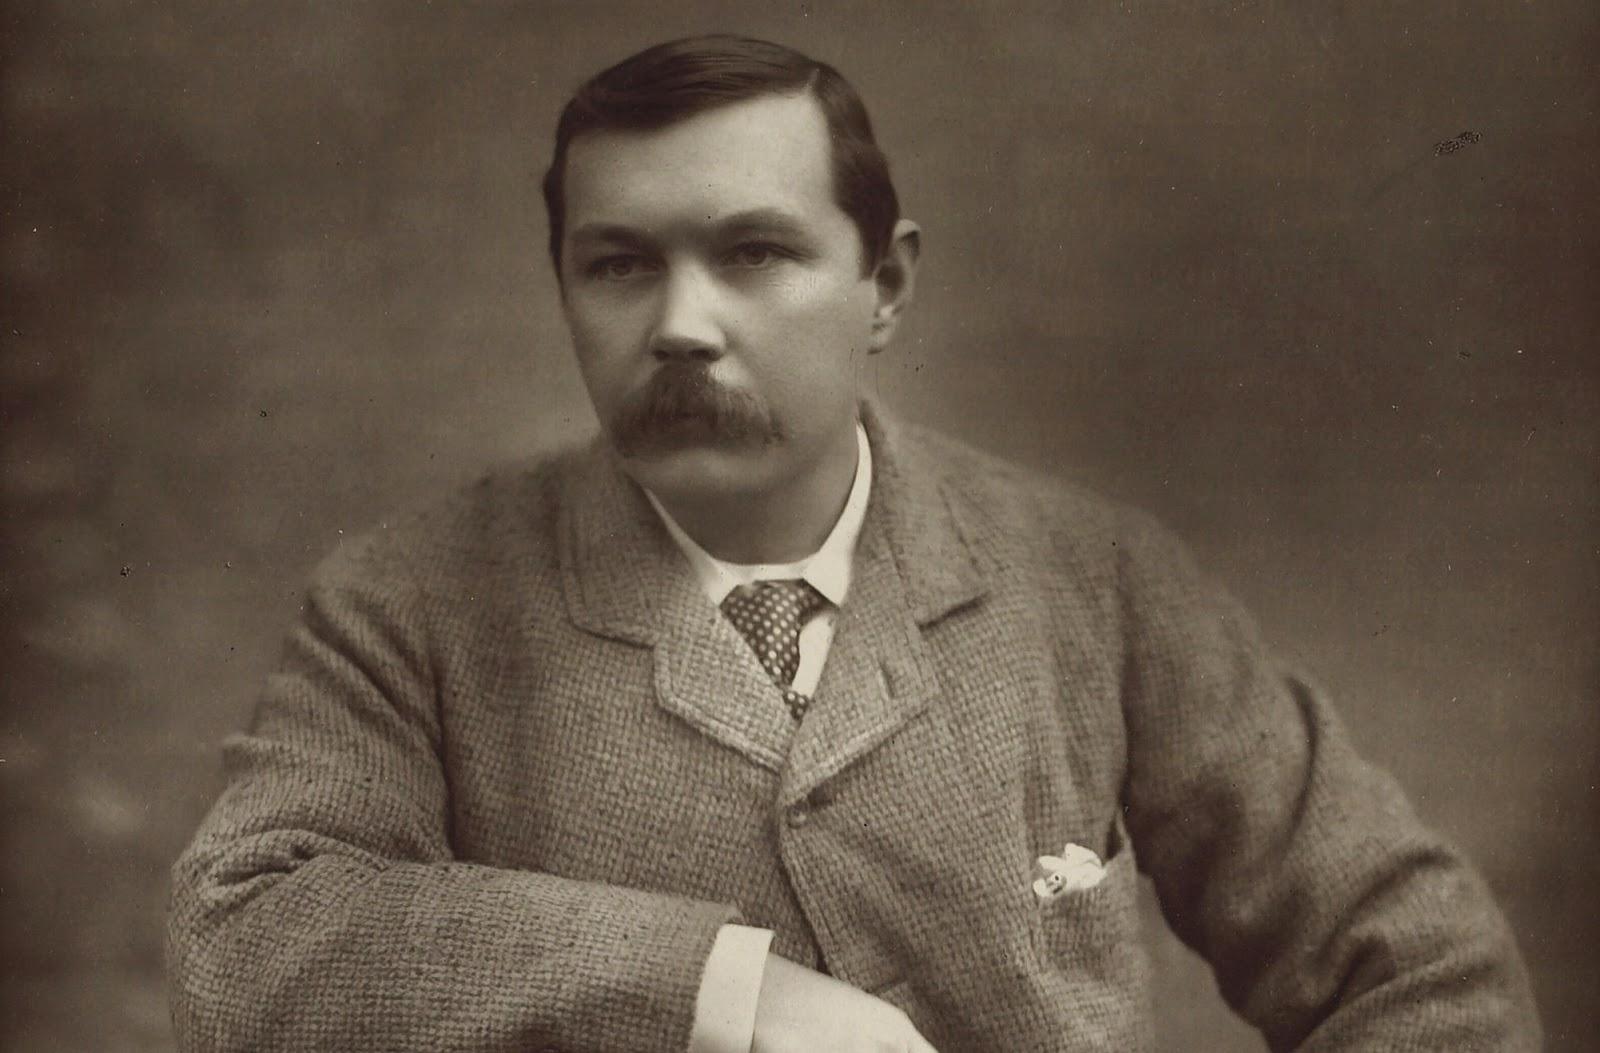 Arthur Conan Doyle portrait 1893 - credit Wikimedia